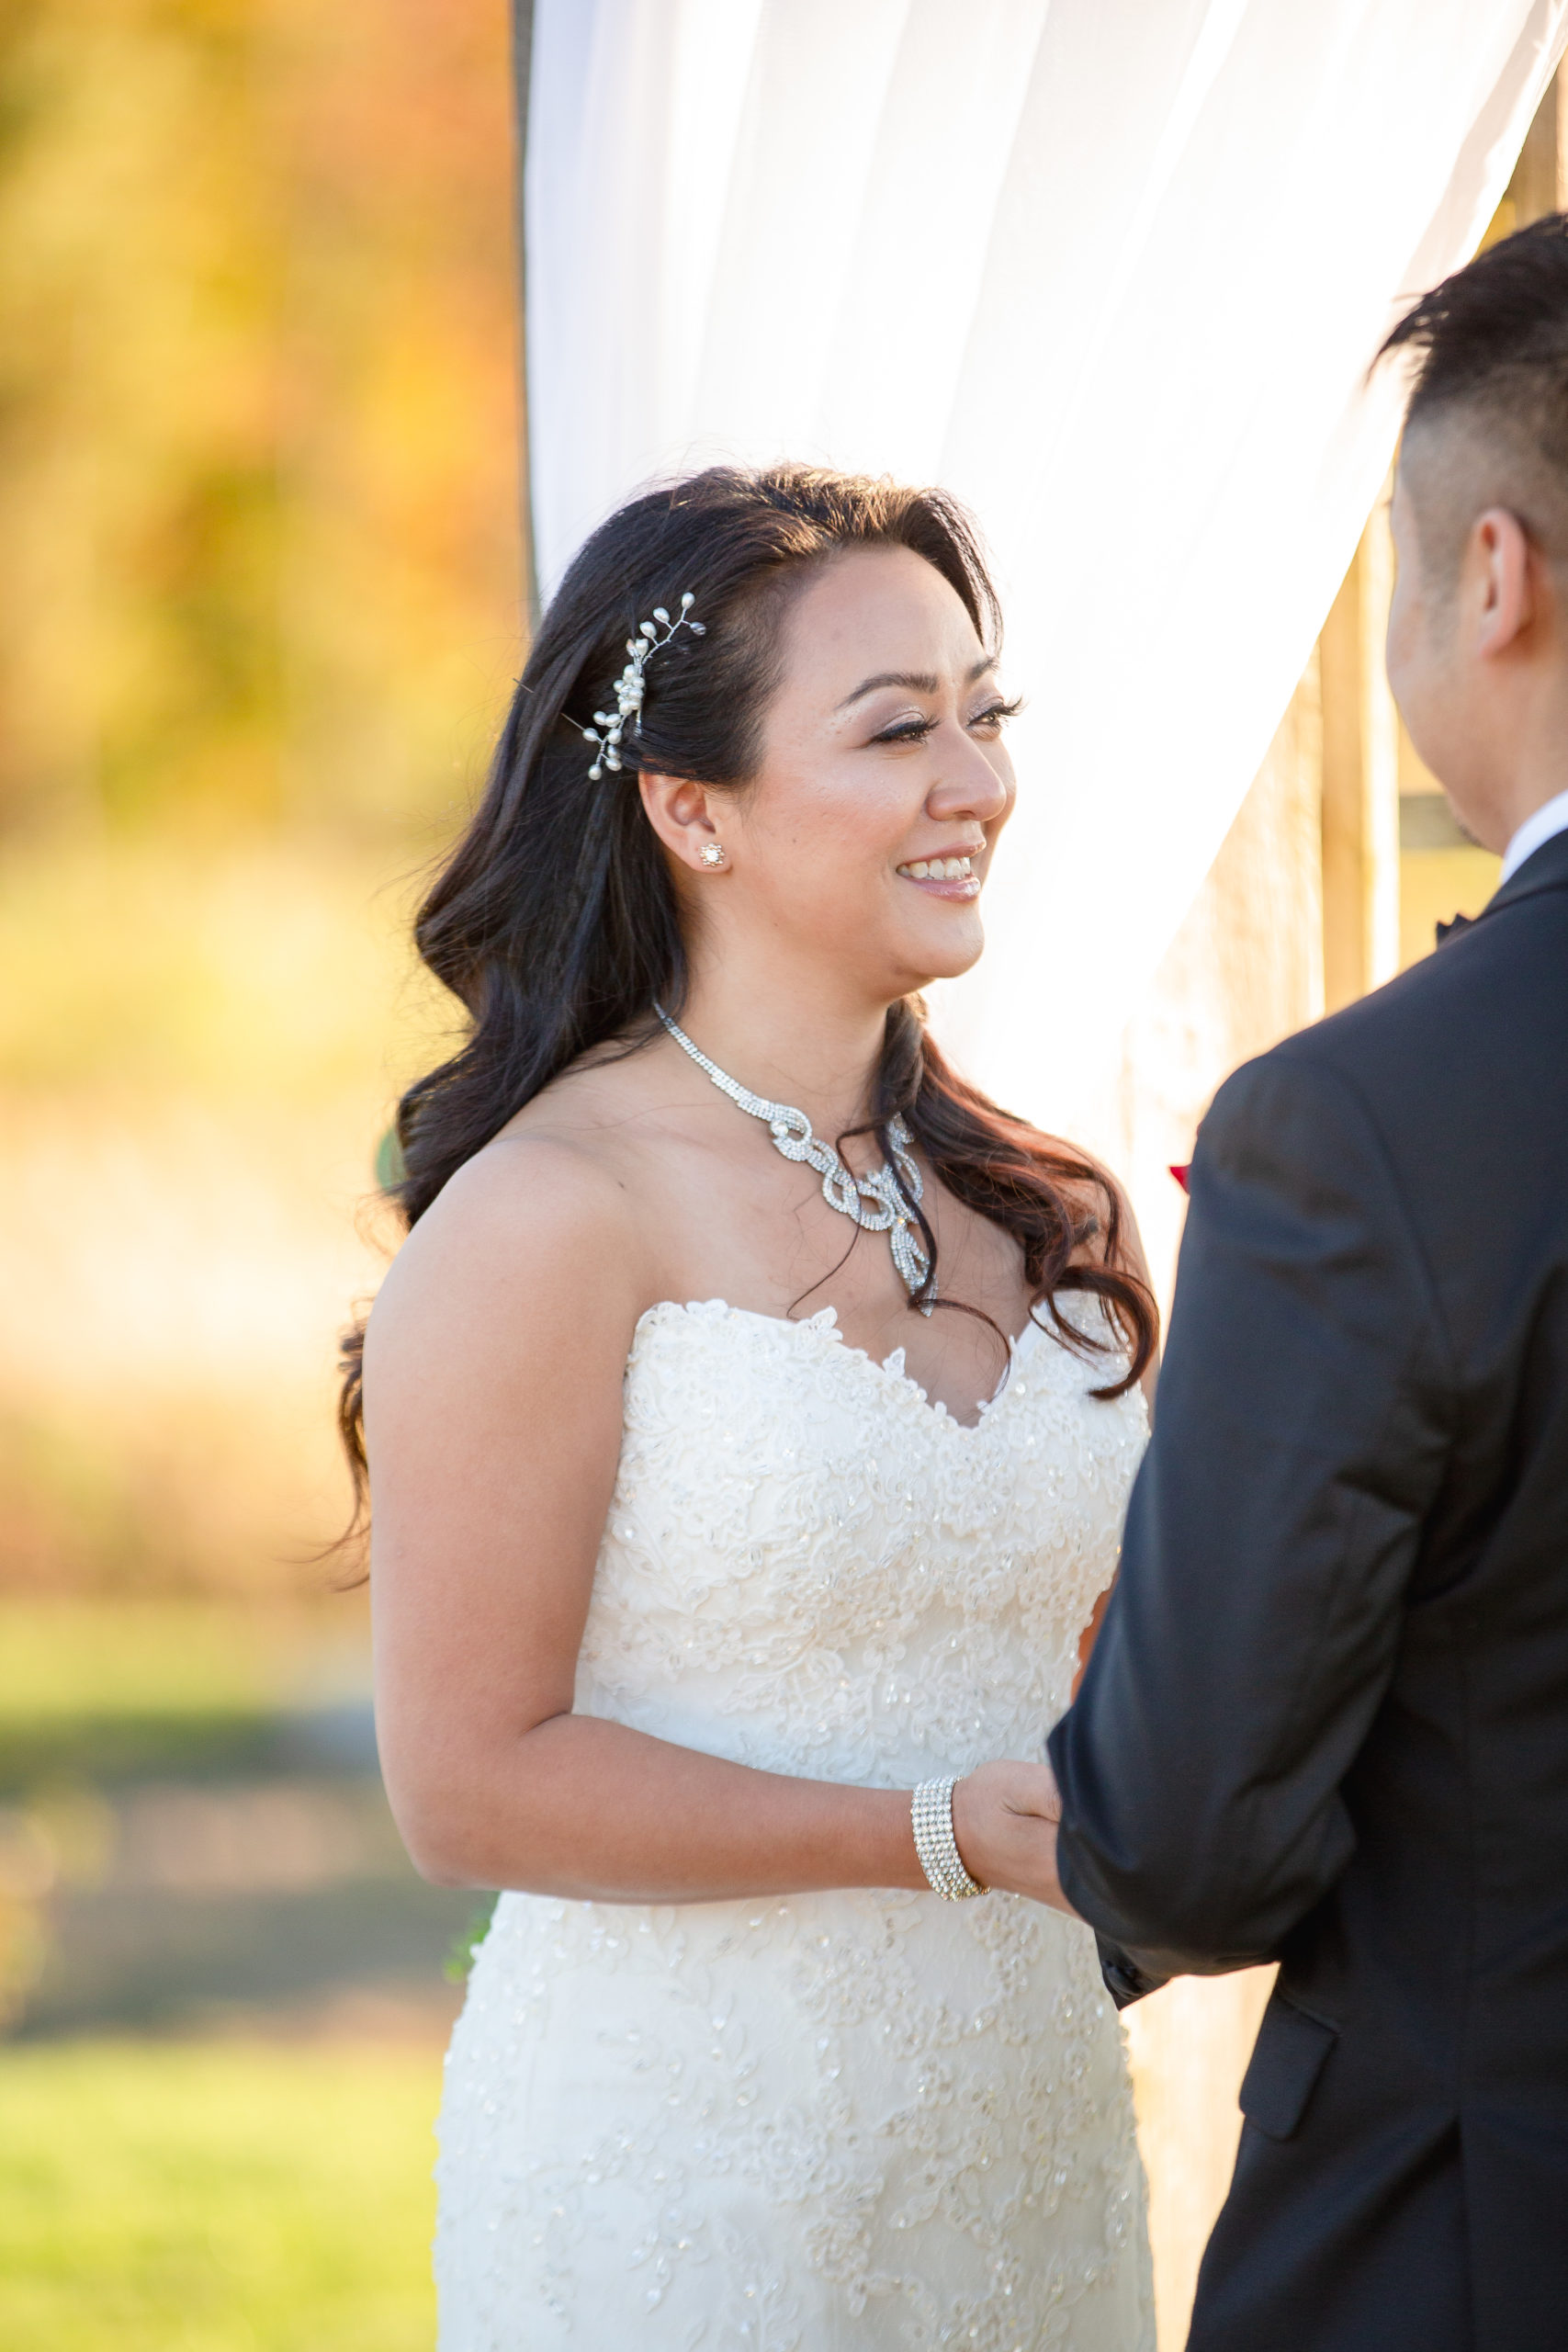 Harbor lights, warwick, rhode island, RI, Tracy Jenkins Photography, RI wedding photographer, Rhode Island wedding photographer, micro-wedding, wedding ceremony, vows, bride